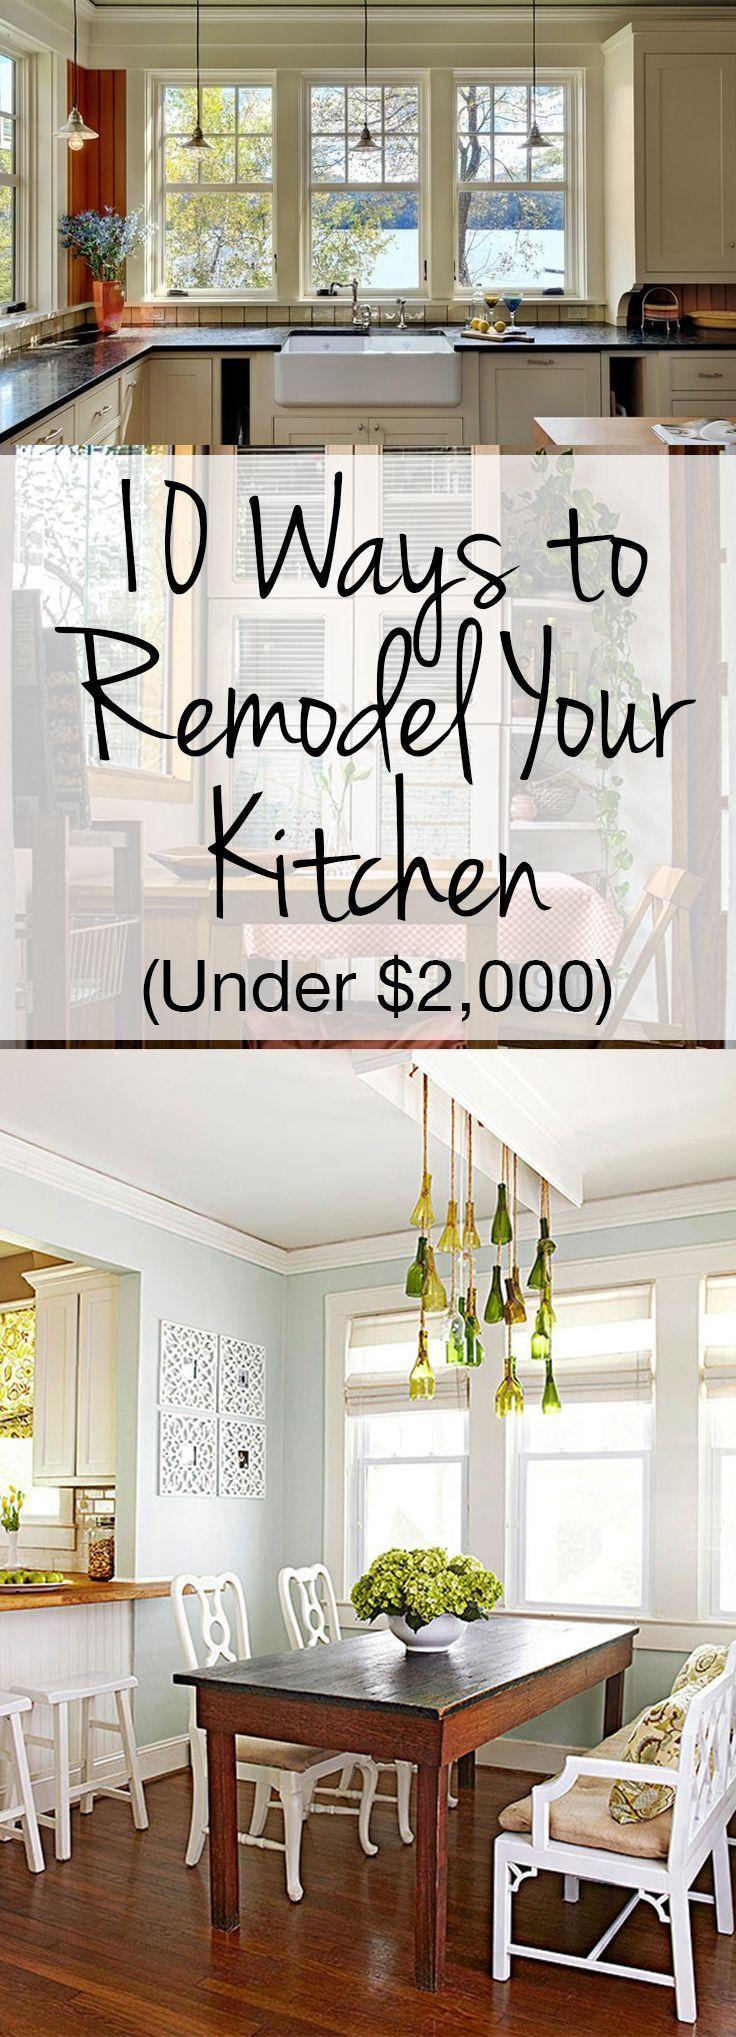 10 Ways To Remodel Your Kitchen Under 2 000 Cheap